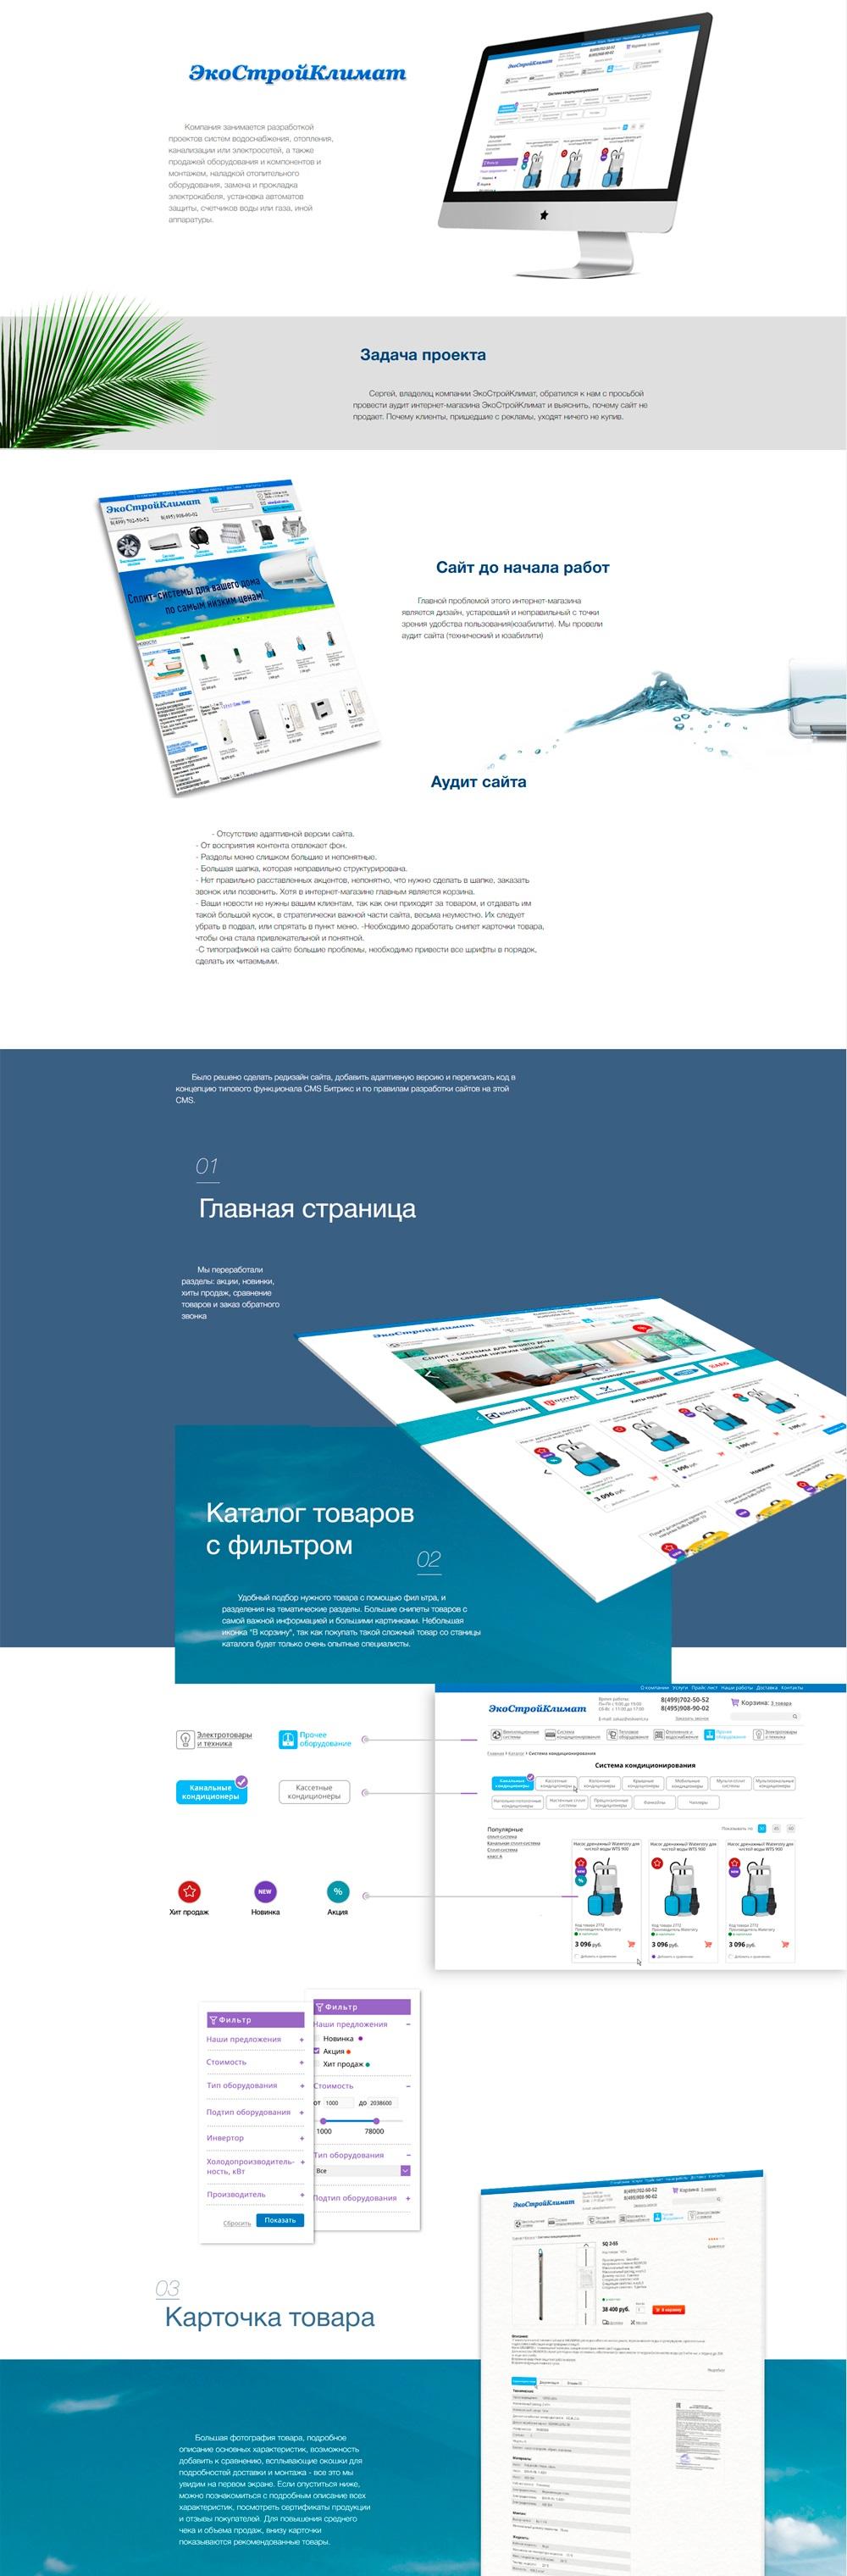 Редизайн интернет-магазина ЭкоСтройКлимат